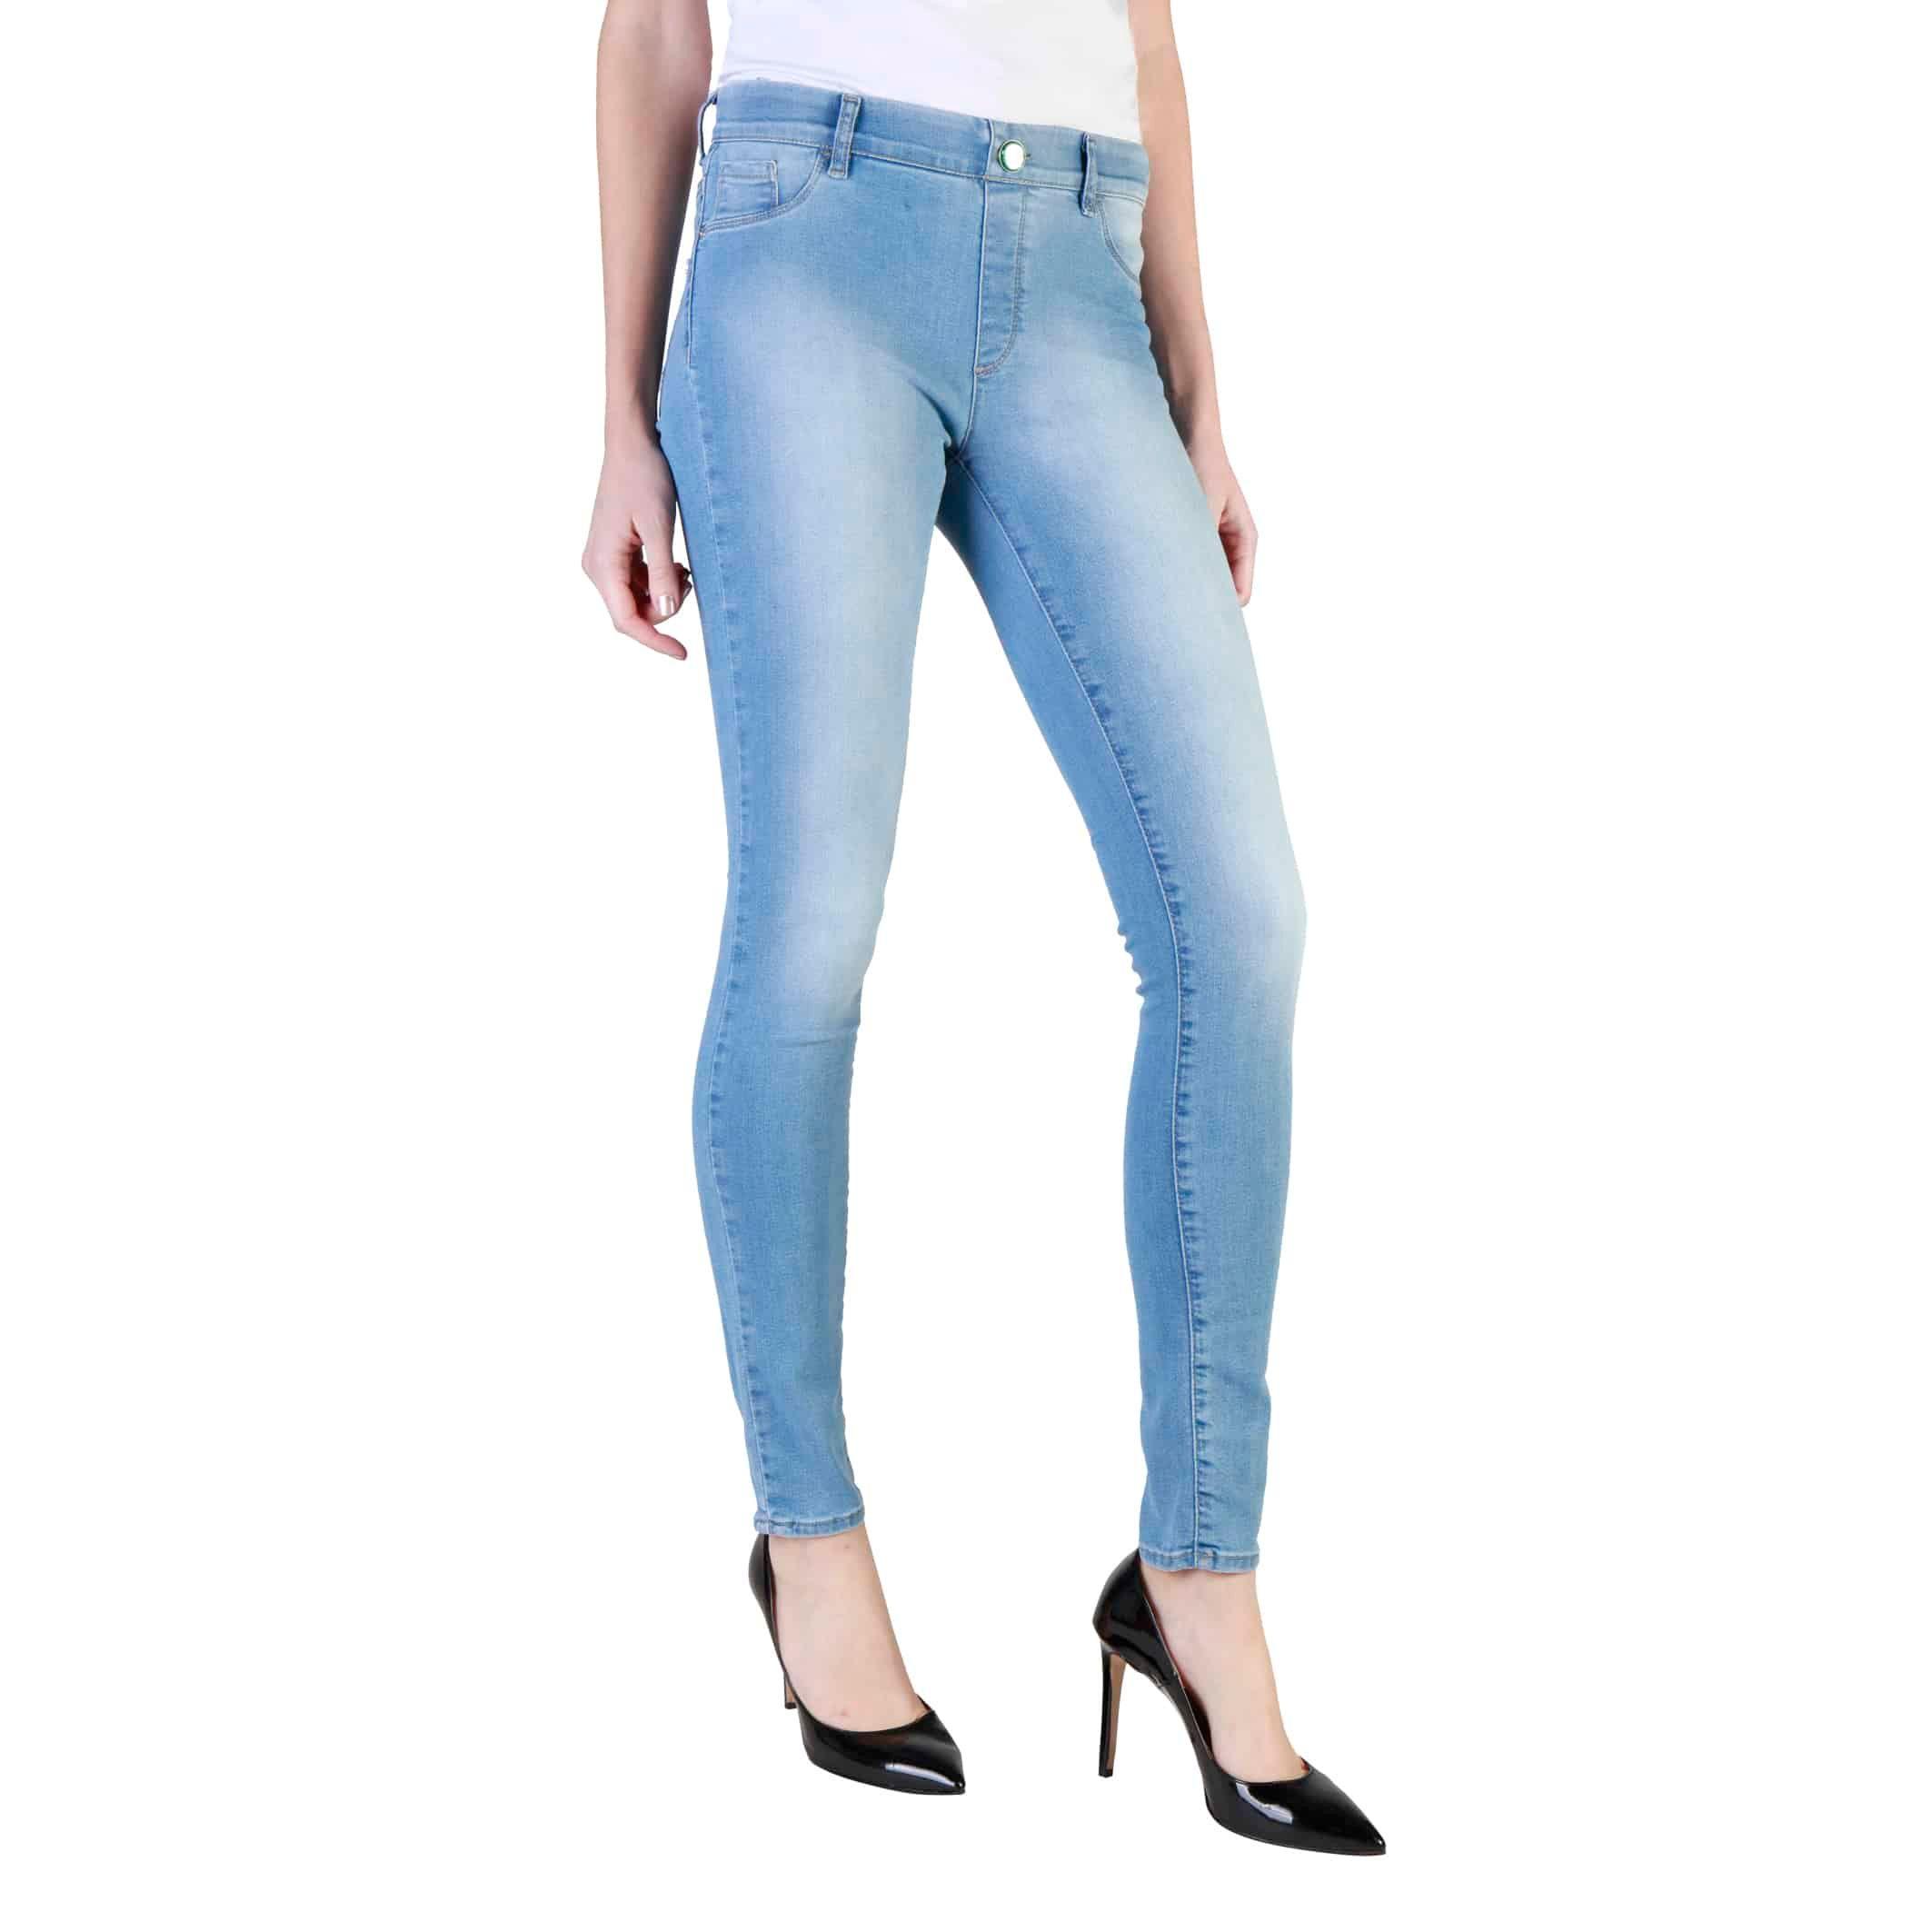 Carrera Jeans - 00767L_822_ALOE